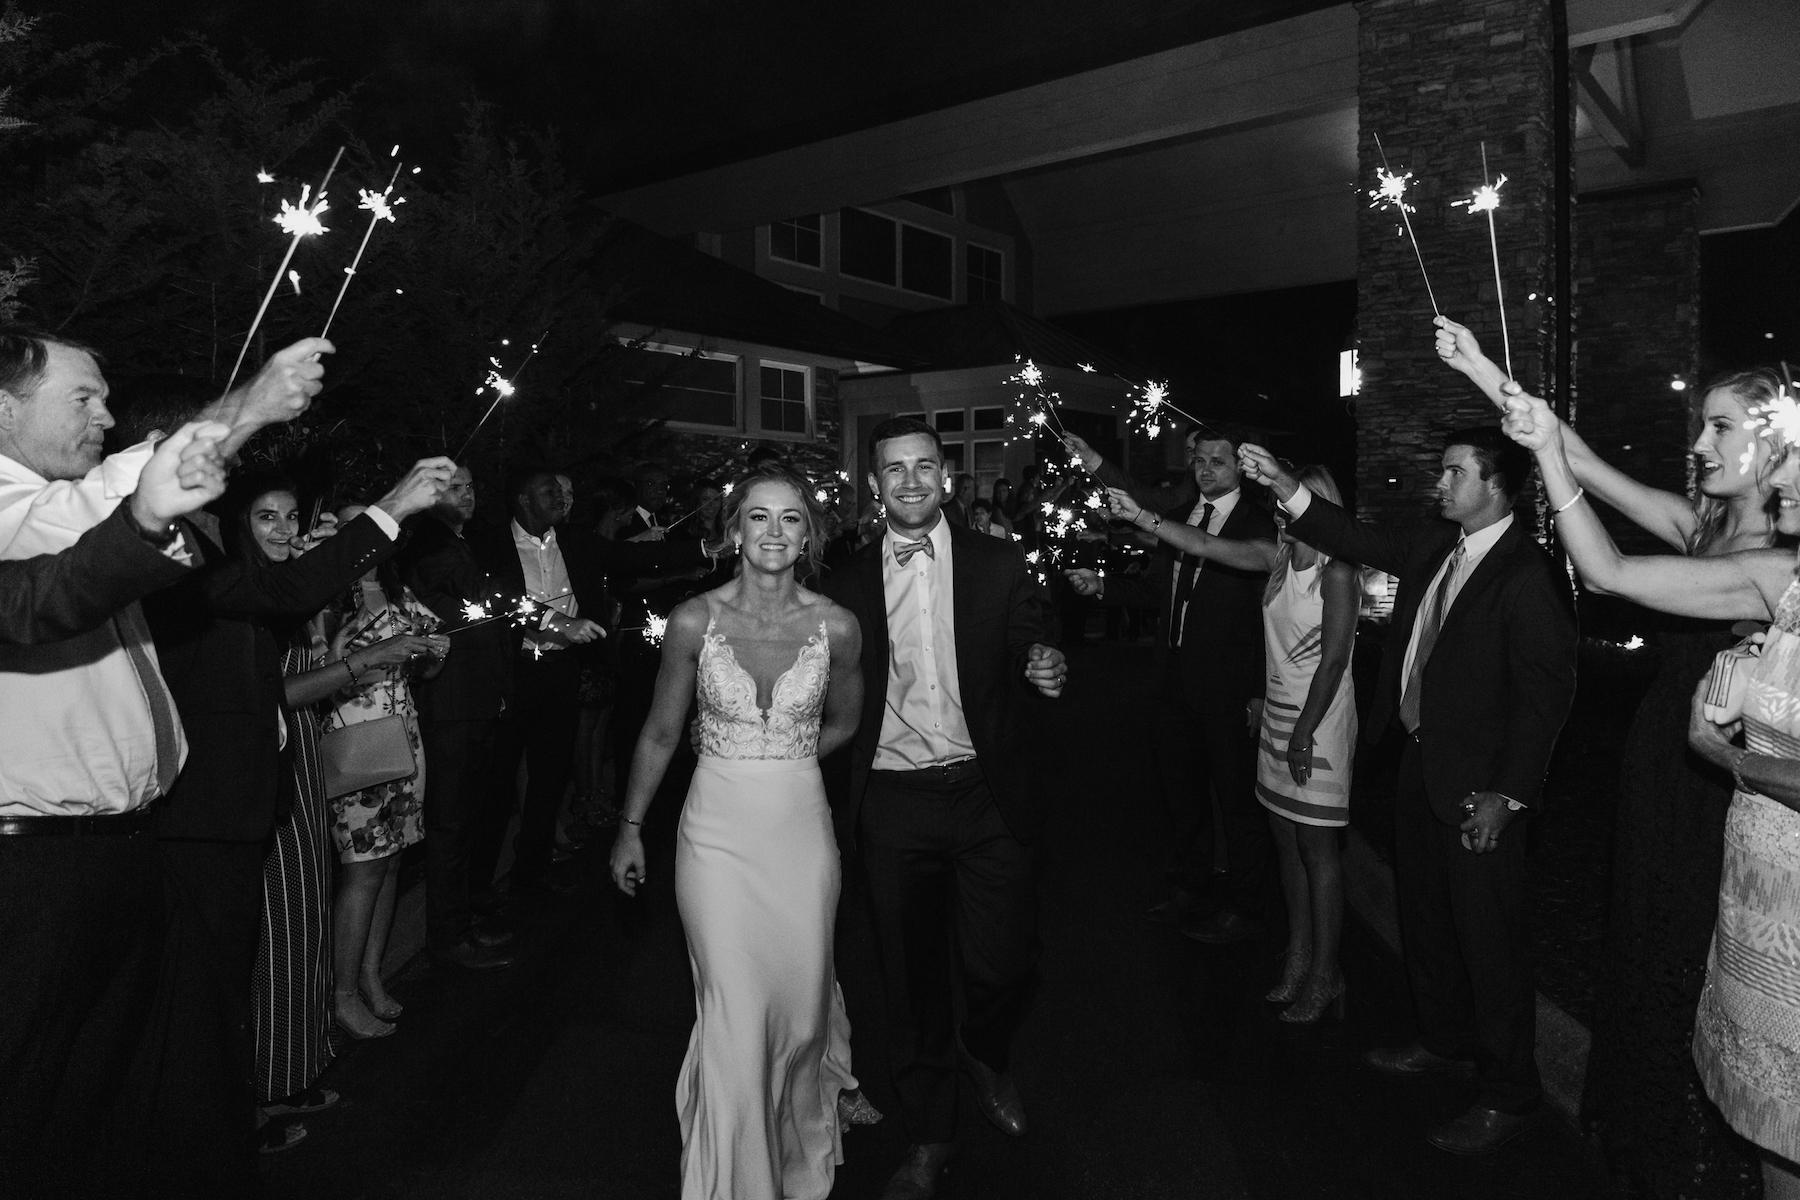 wedding-engagement-photographer-spartanburg-greenville-columbia-carolina-south-north-549.JPG